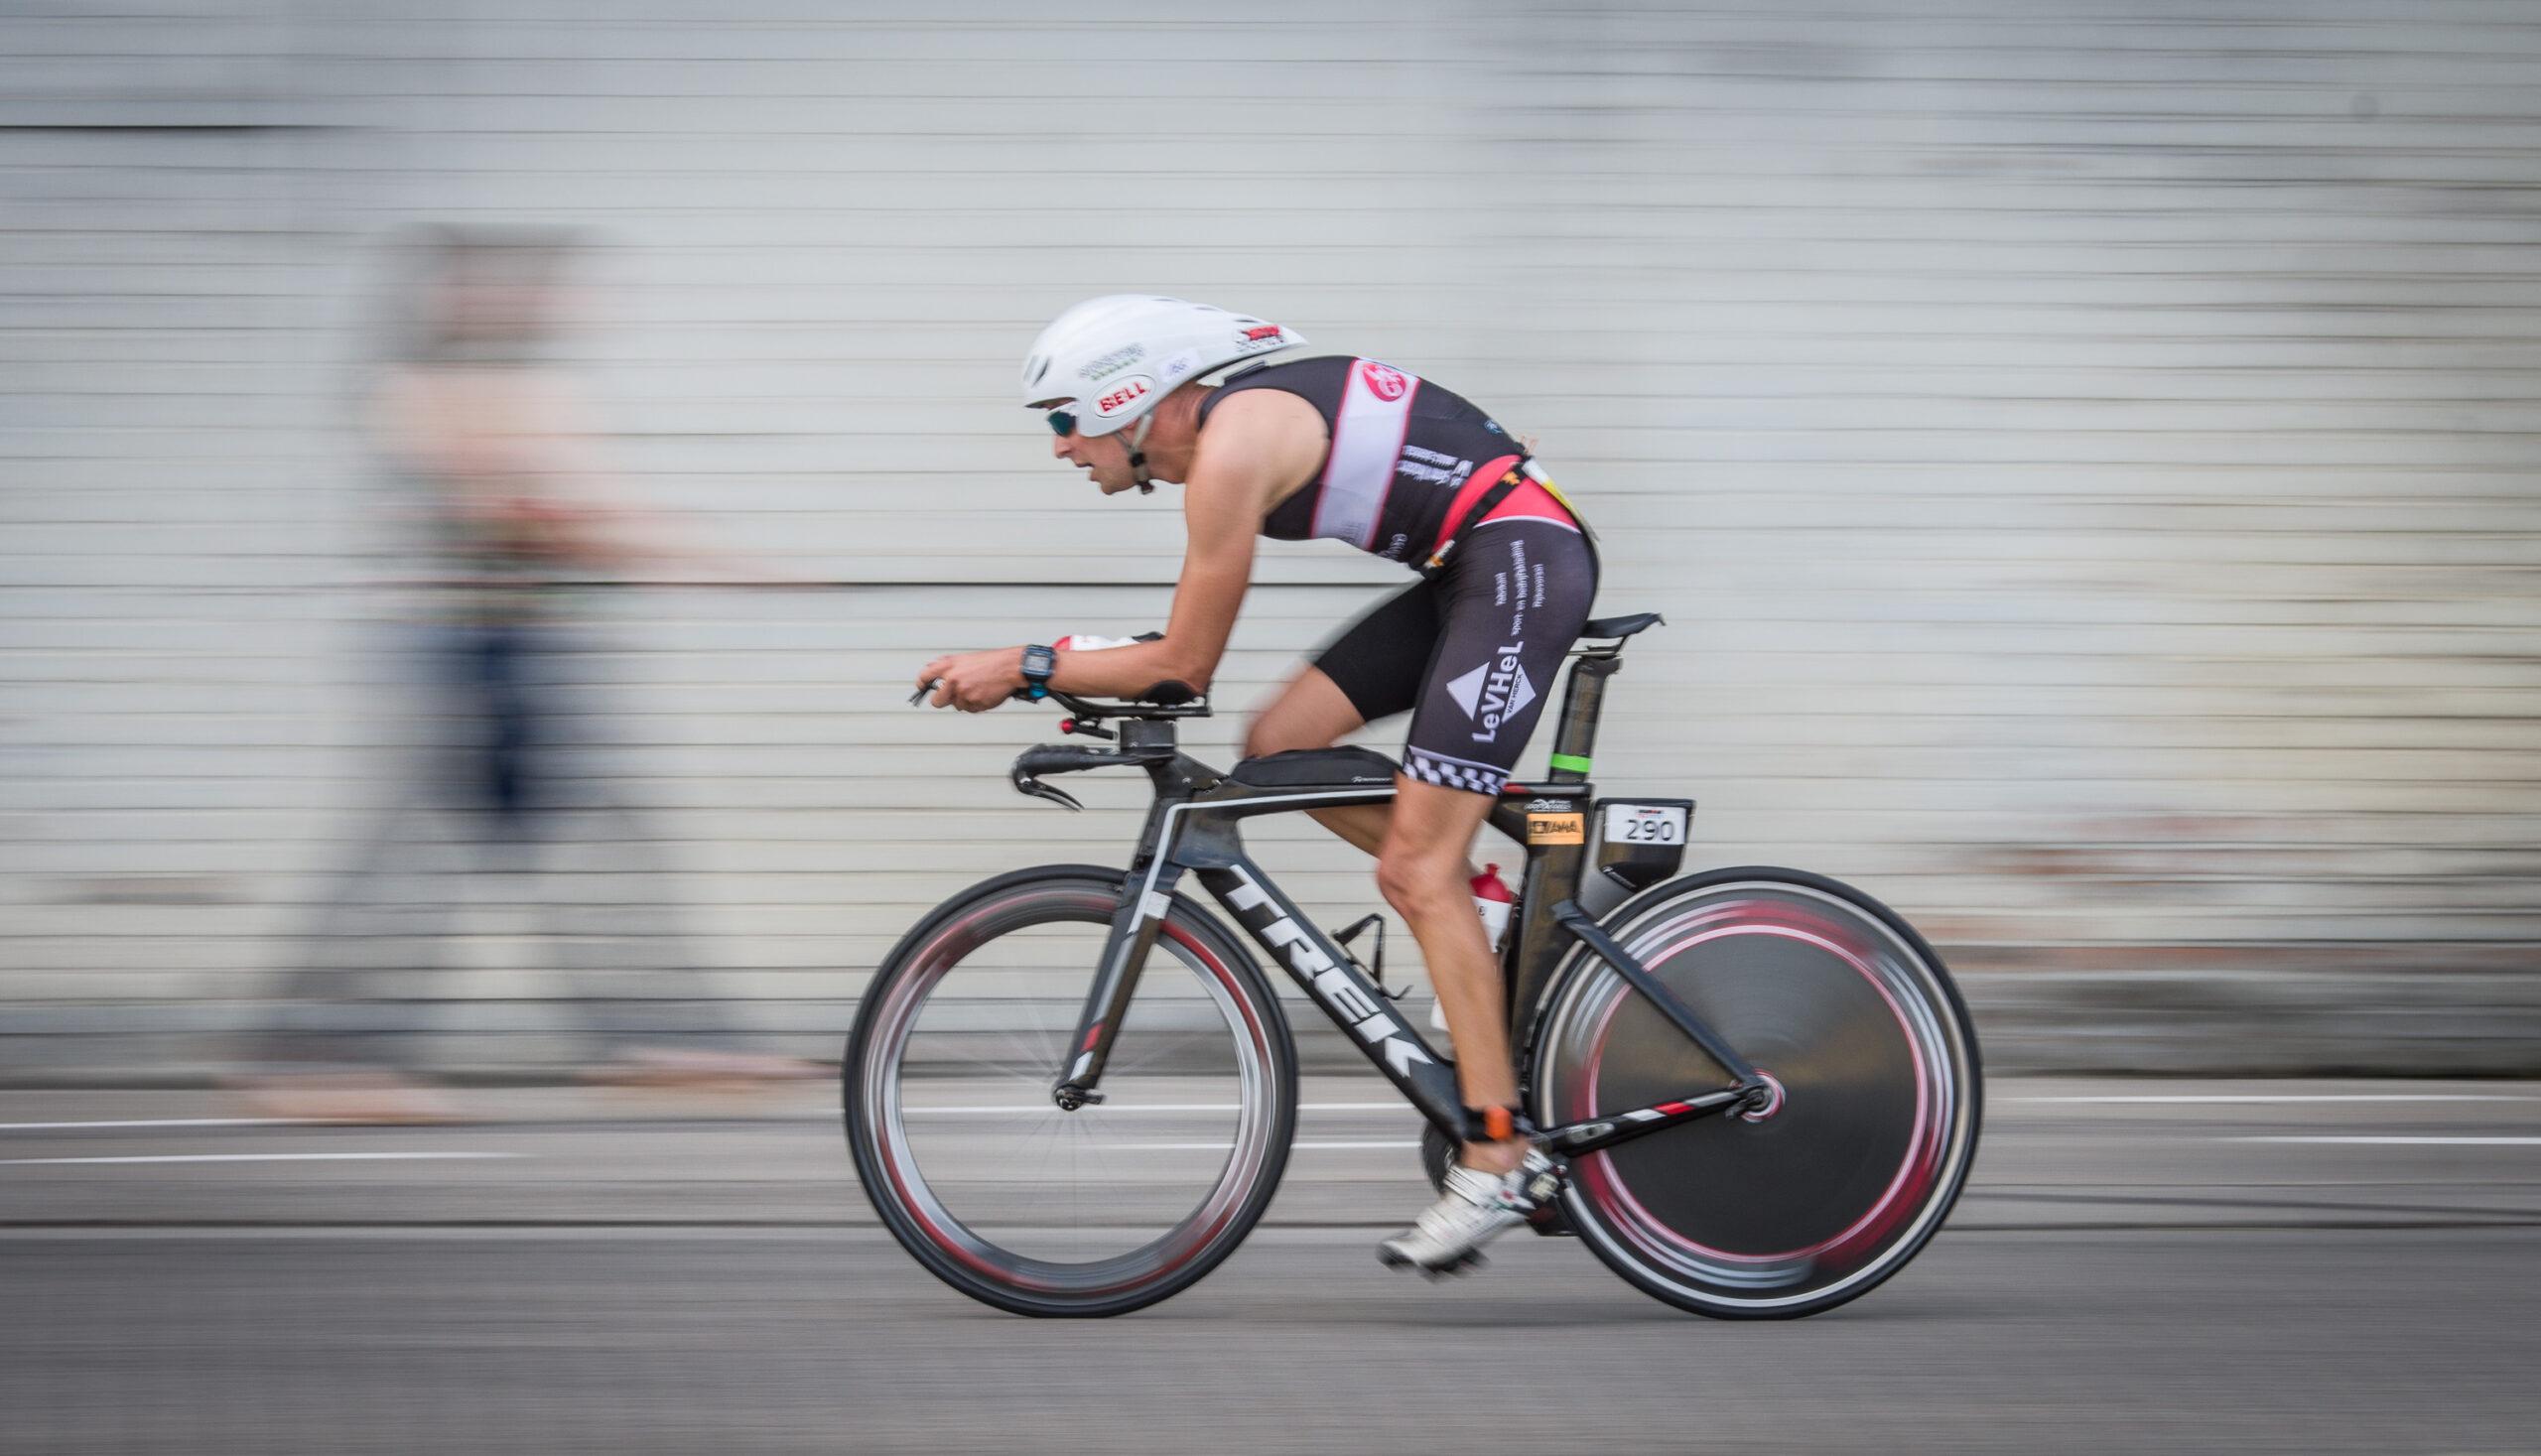 Finishfoto.be fietser